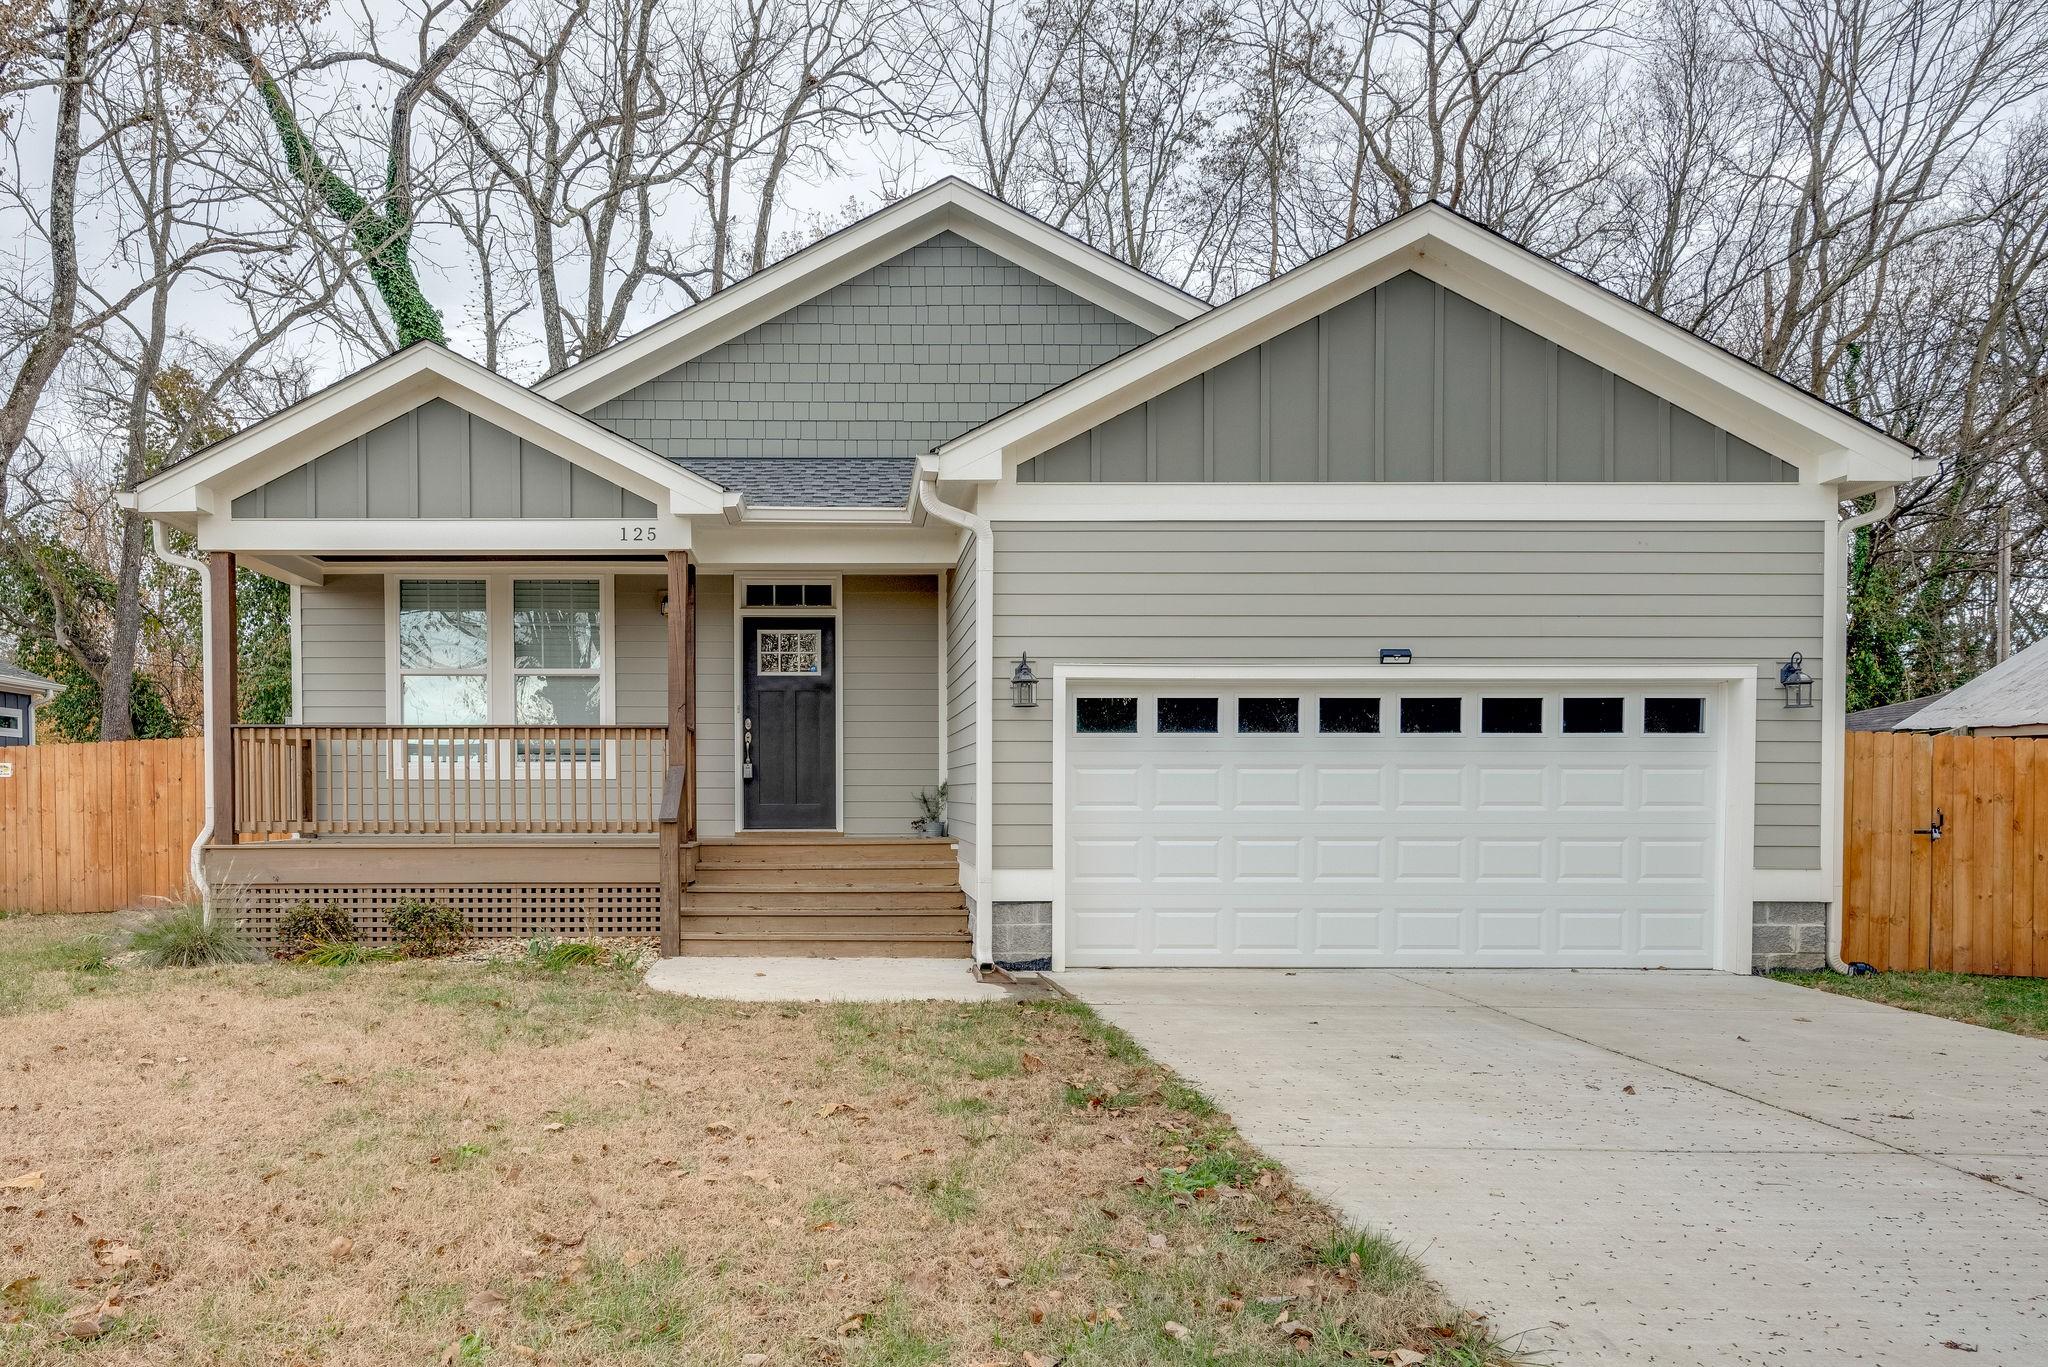 125 Elizabeth St, Ashland City, TN 37015 - Ashland City, TN real estate listing